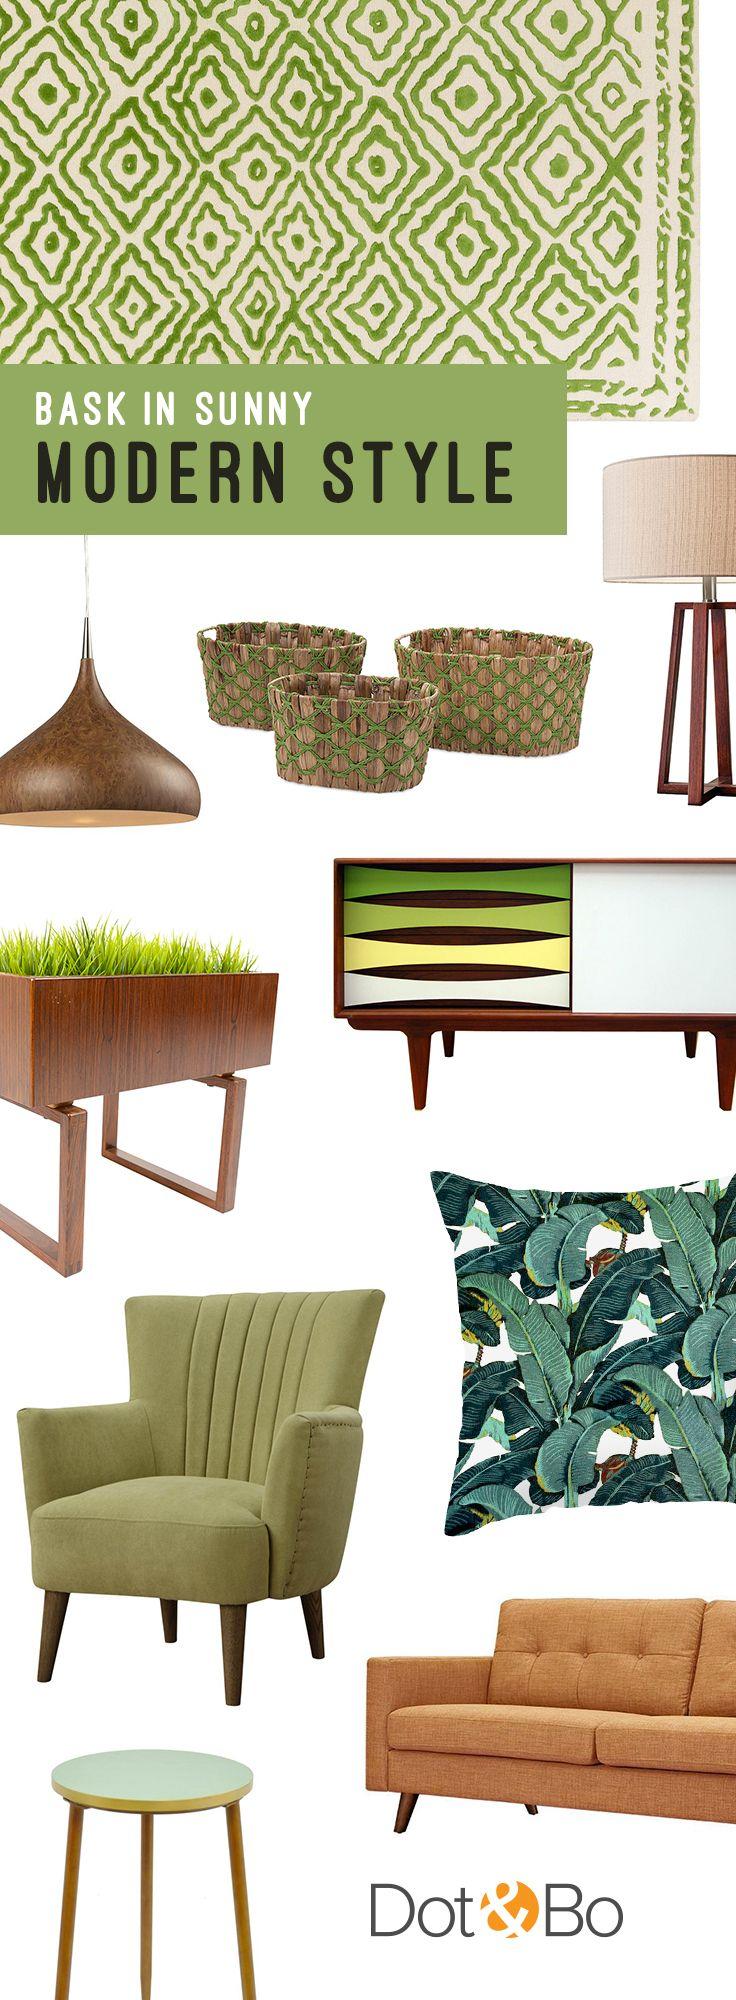 Modern Nature-Inspired Furniture & Décor | Shop Now at dotandbo.com